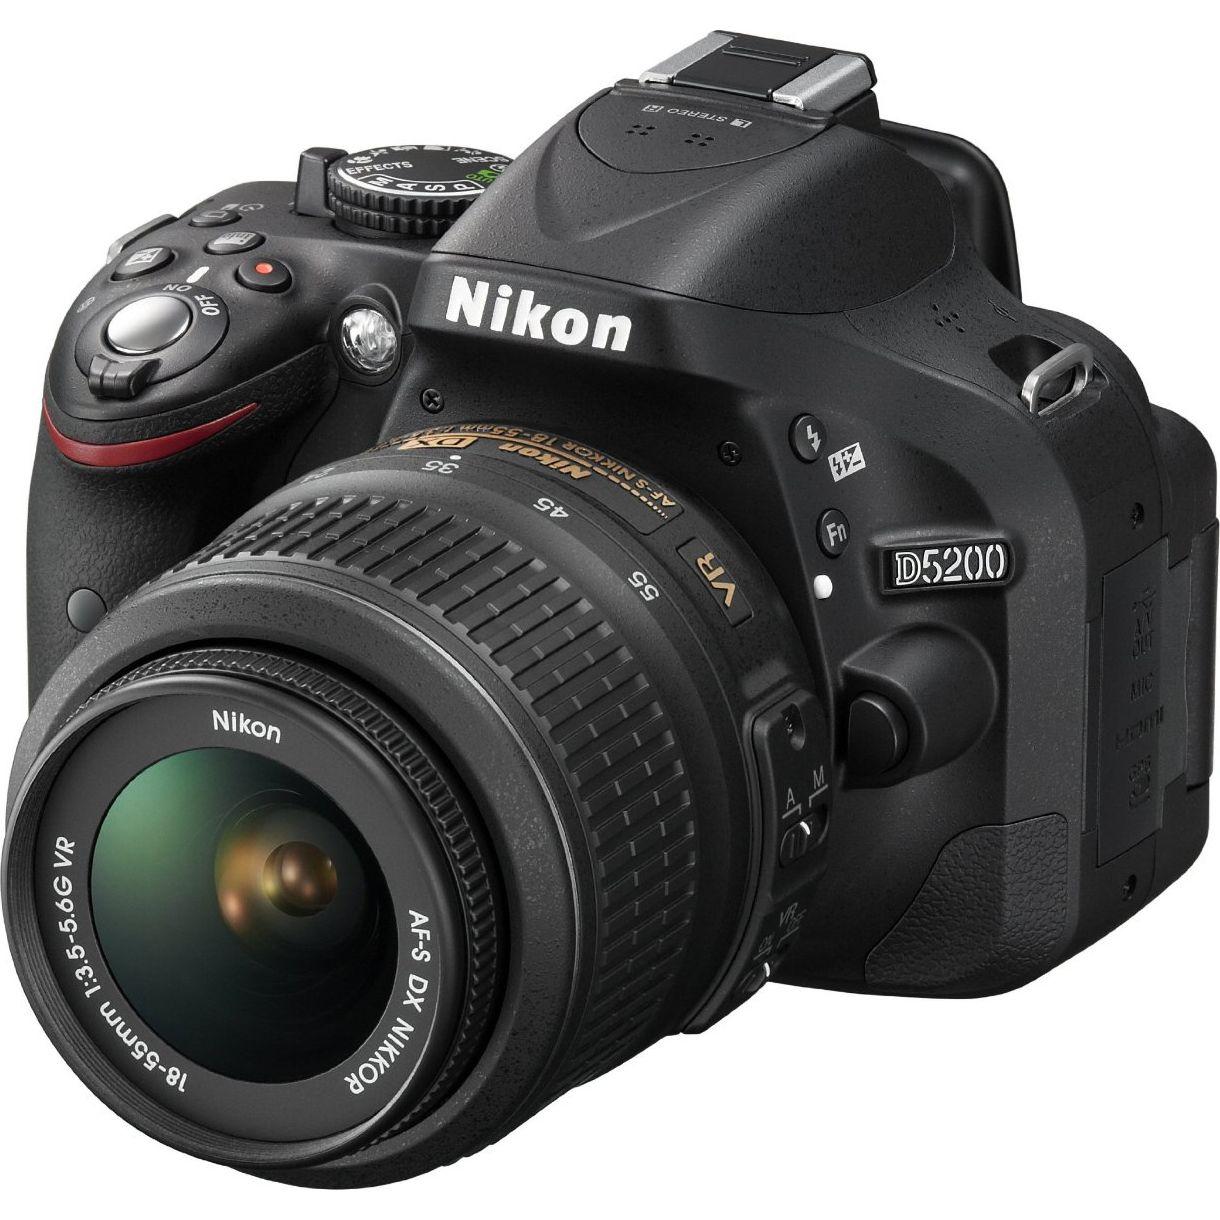 Nikon D5200 Digital Slr Kit W 18 55mm Lens Bundle Accessories Best Digital Camera Nikon Digital Camera Best Dslr